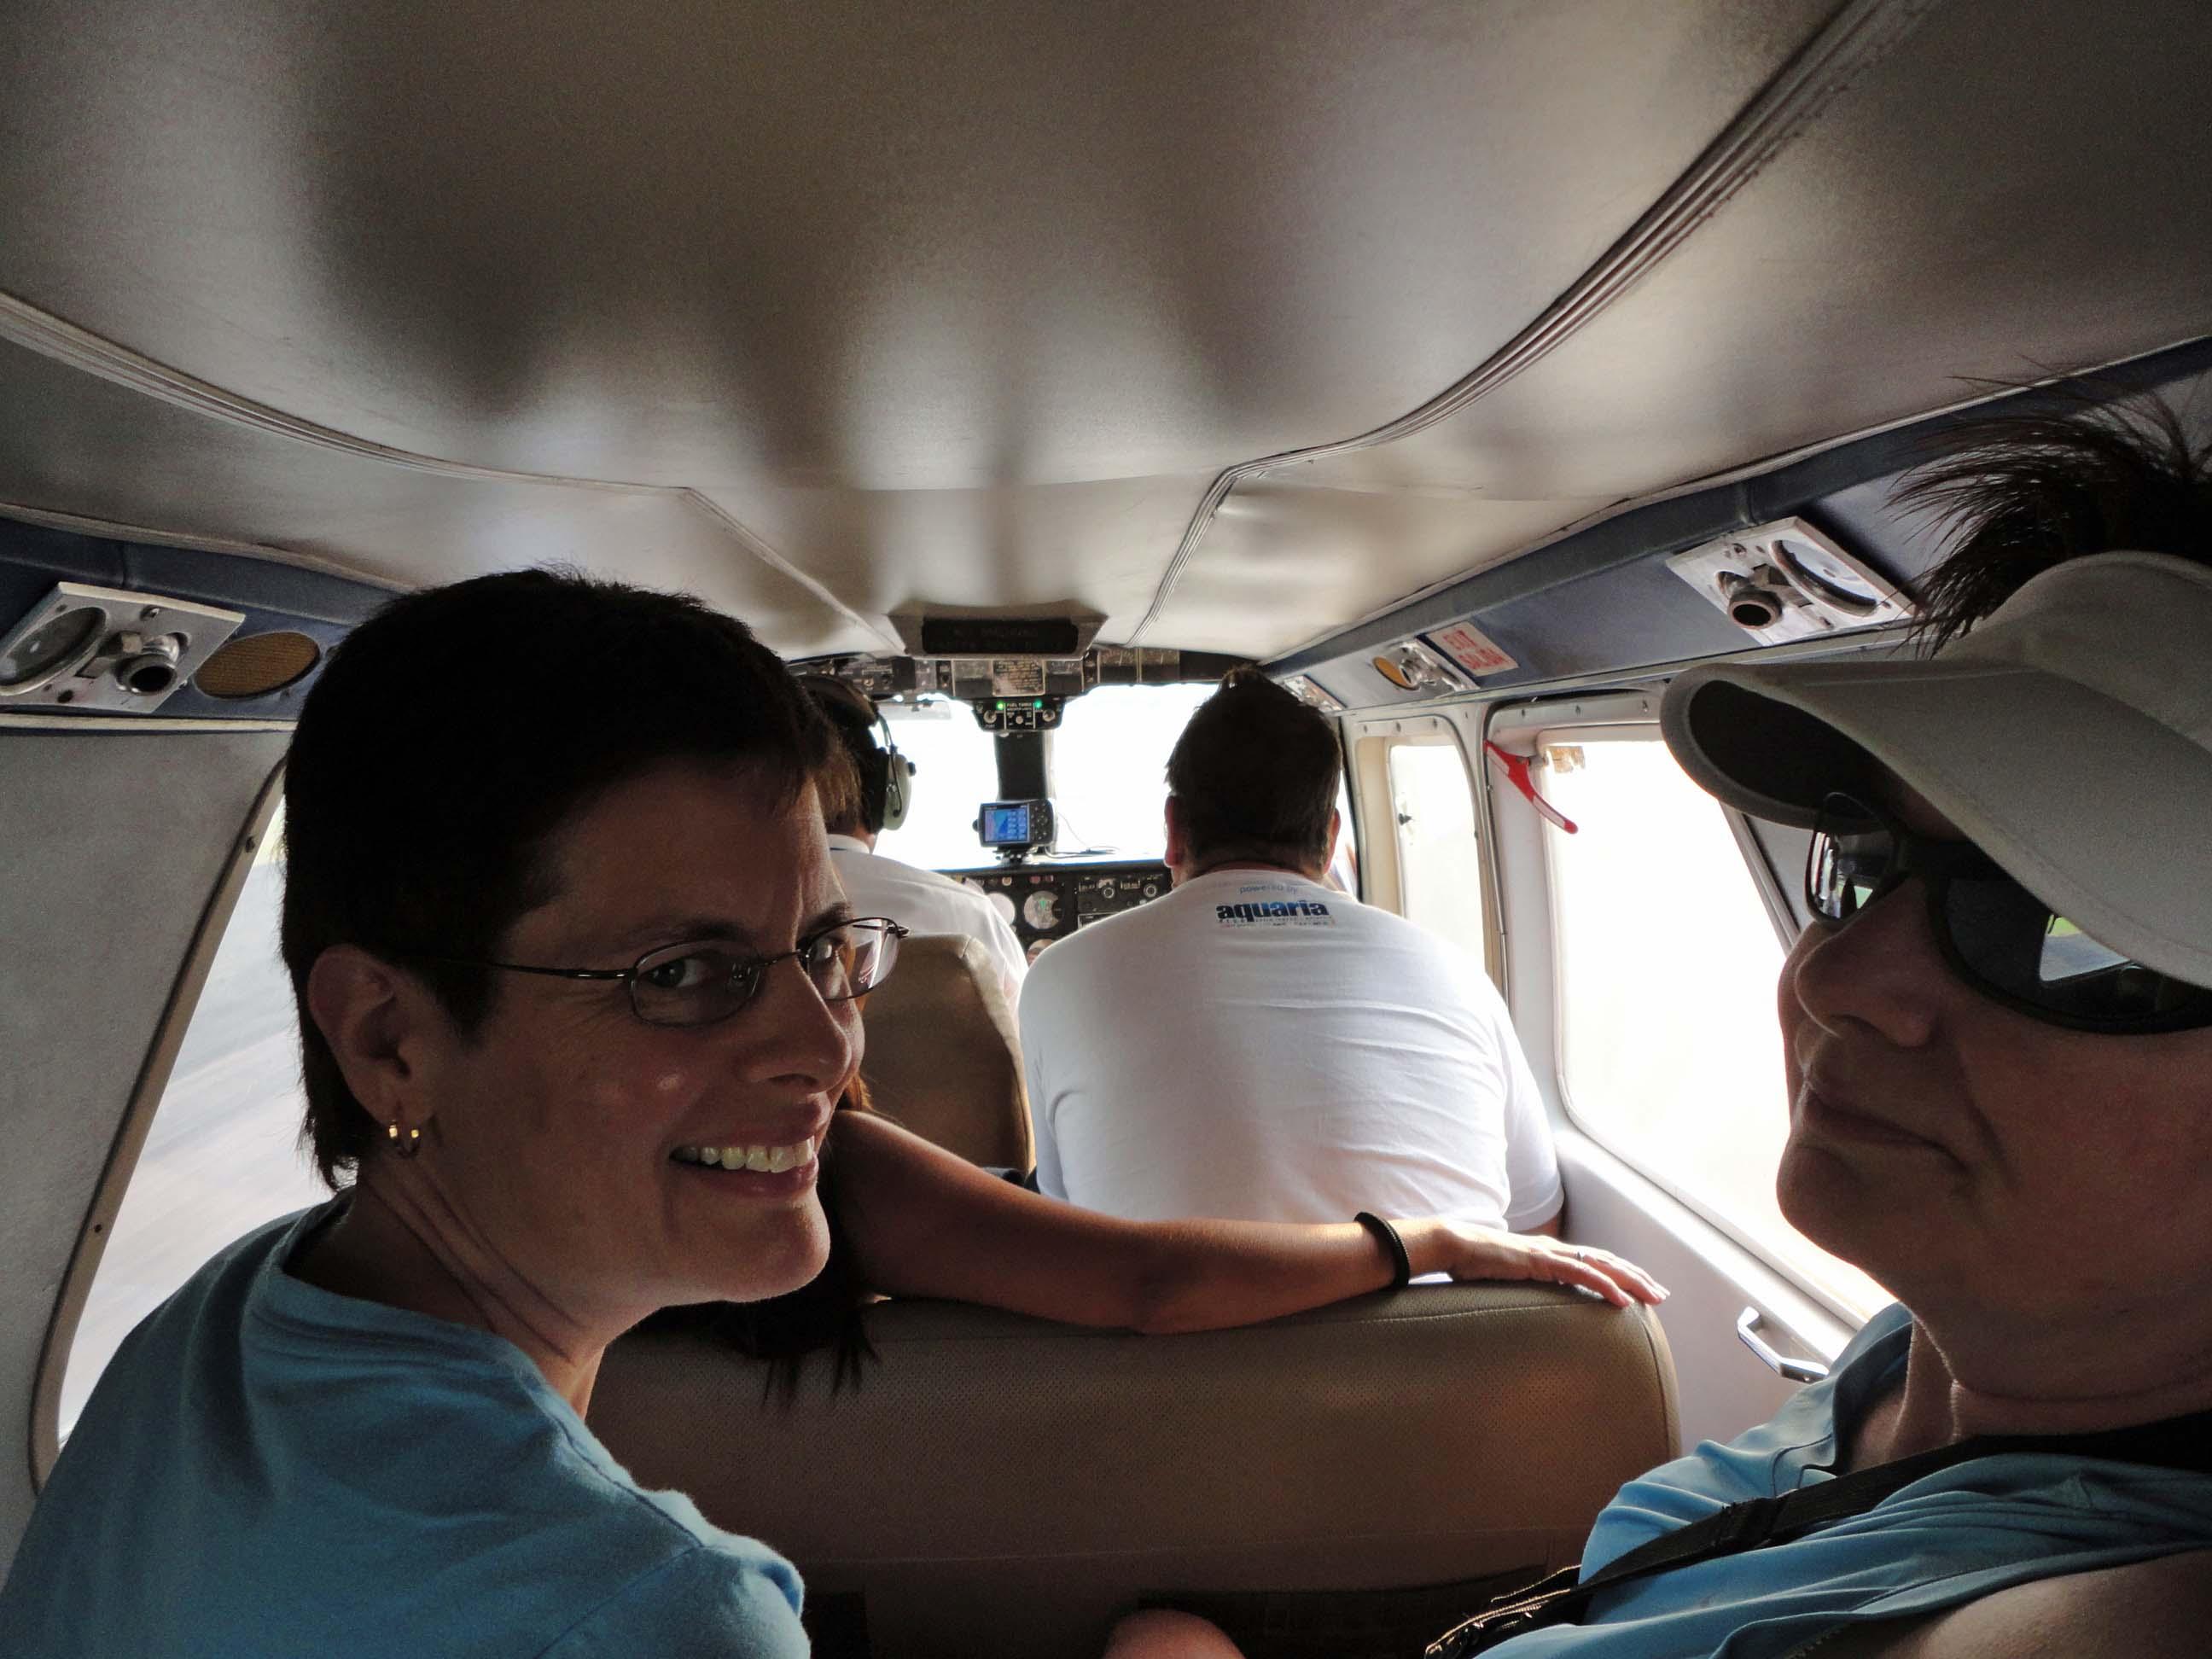 Plane to Utila interior